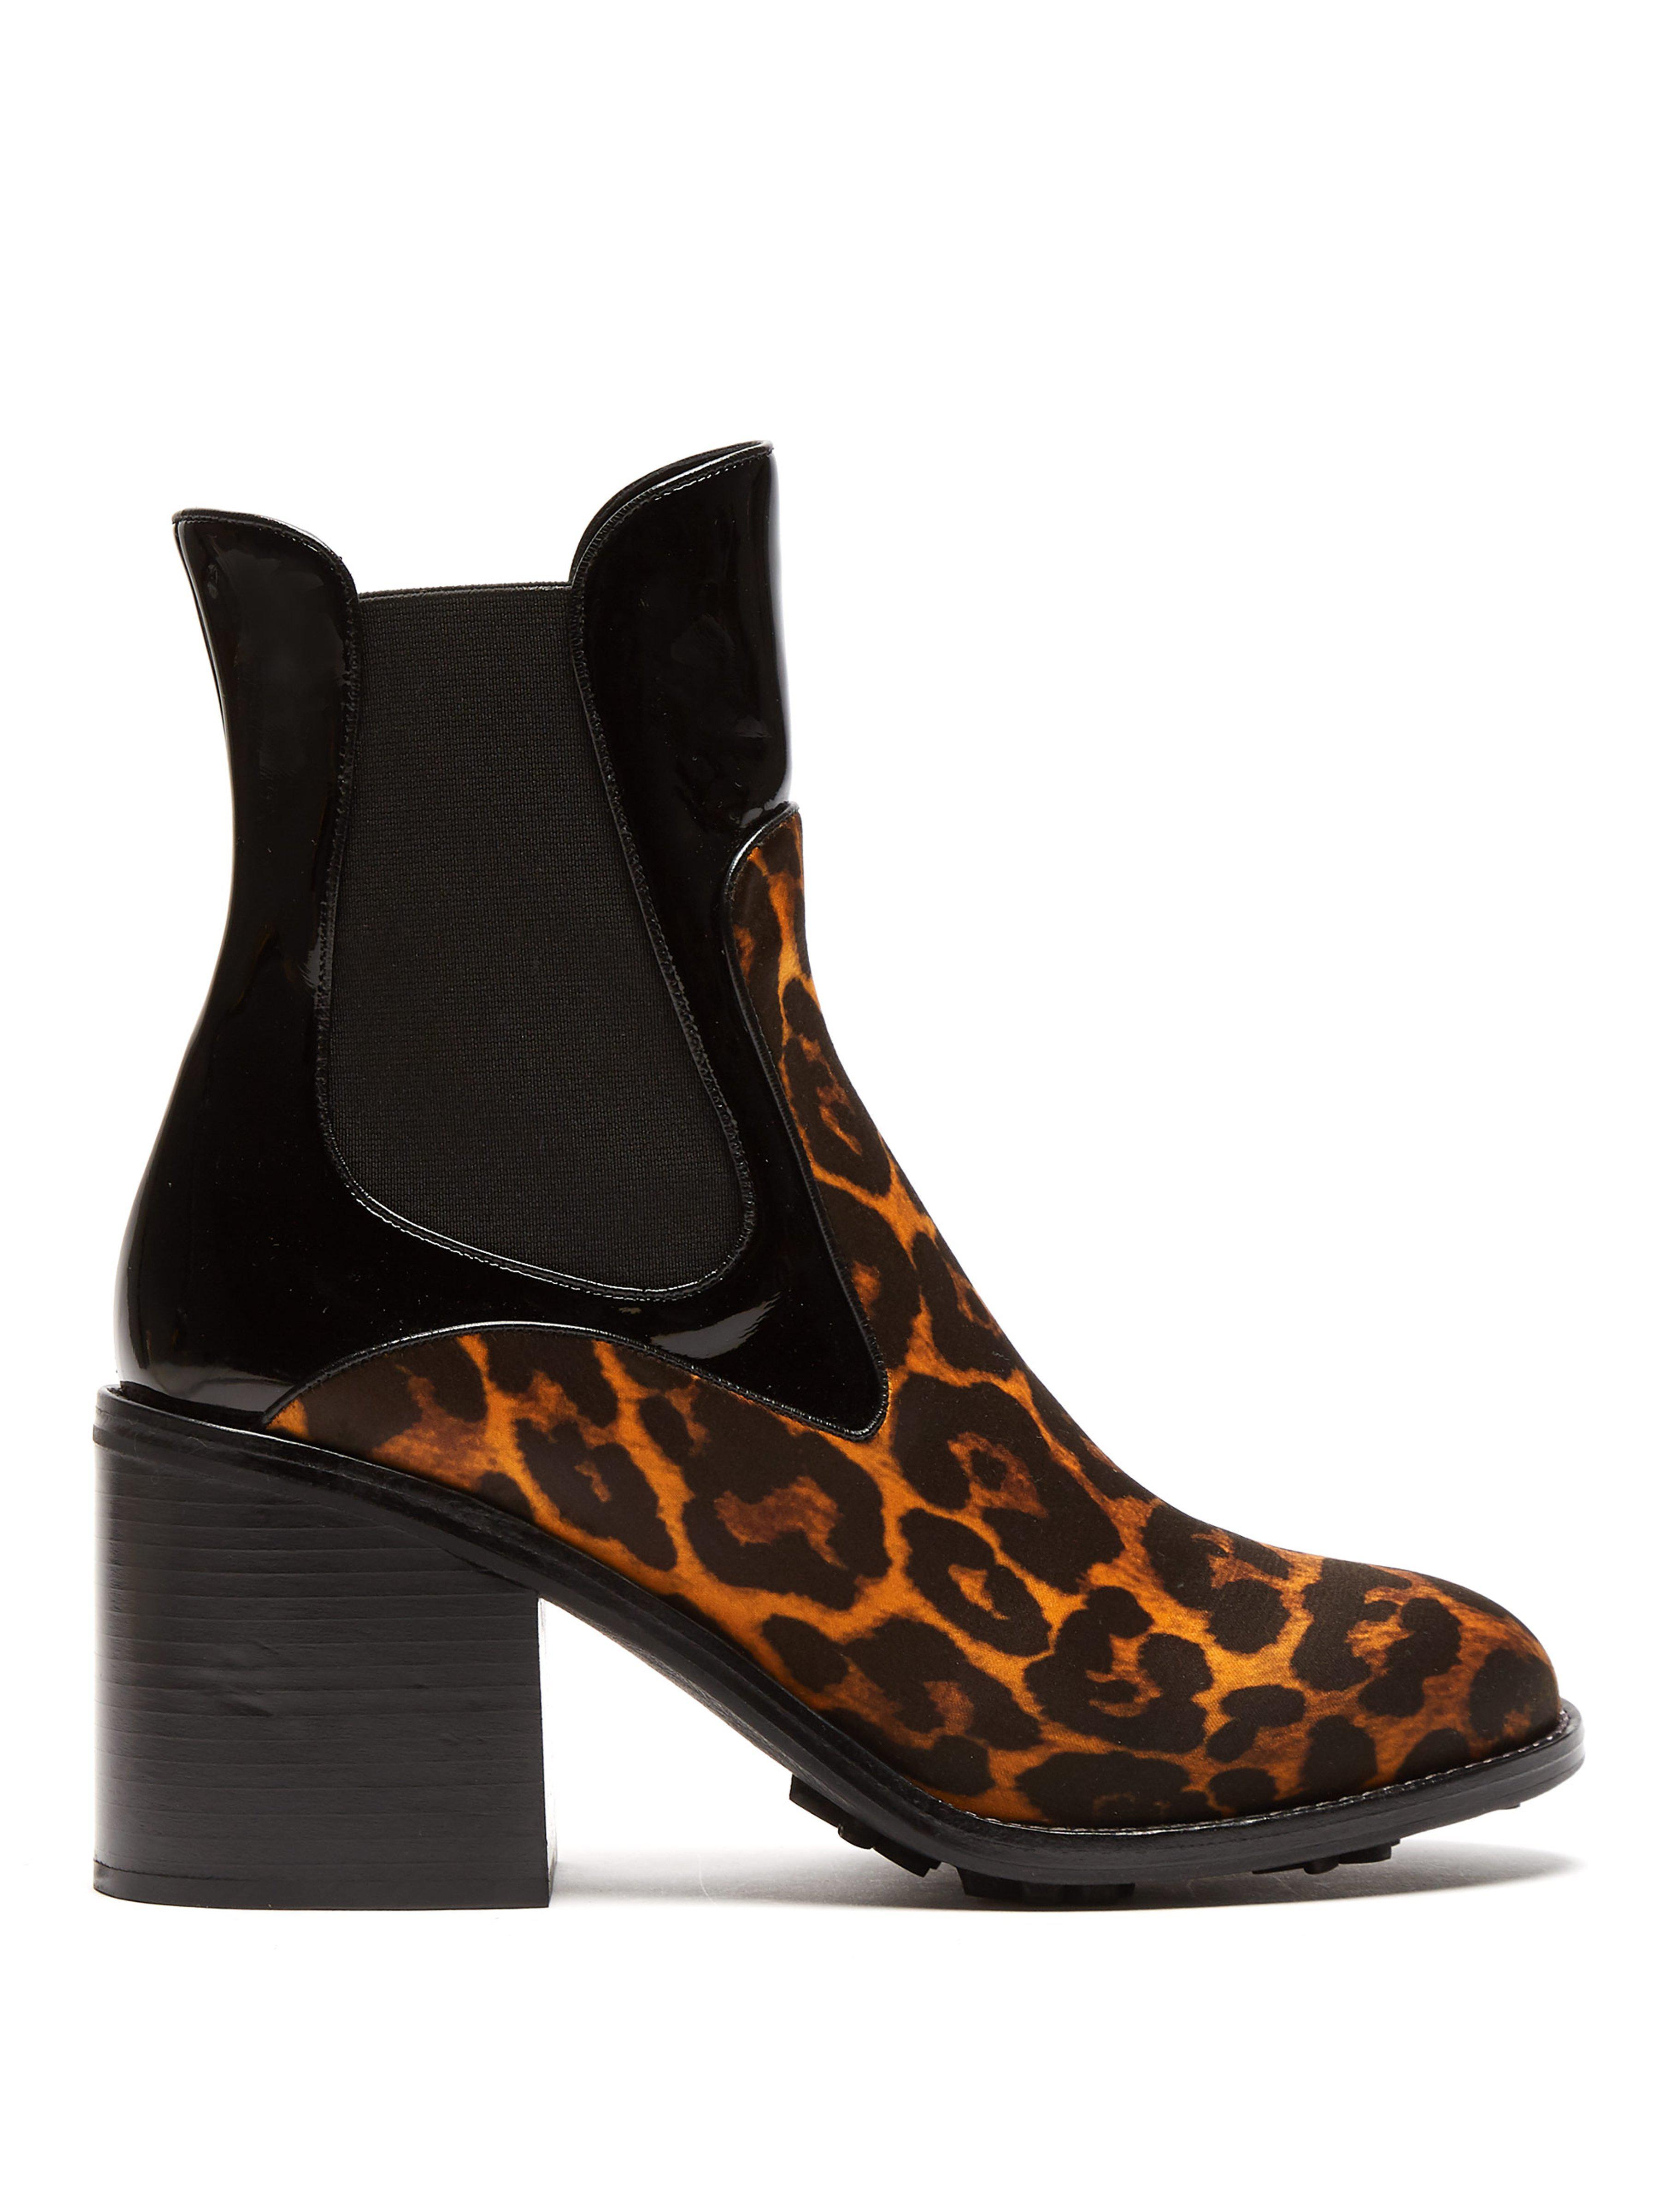 0bda6095478f7 Fabrizio Viti Madison Leopard Print Leather Ankle Boots in Brown - Lyst